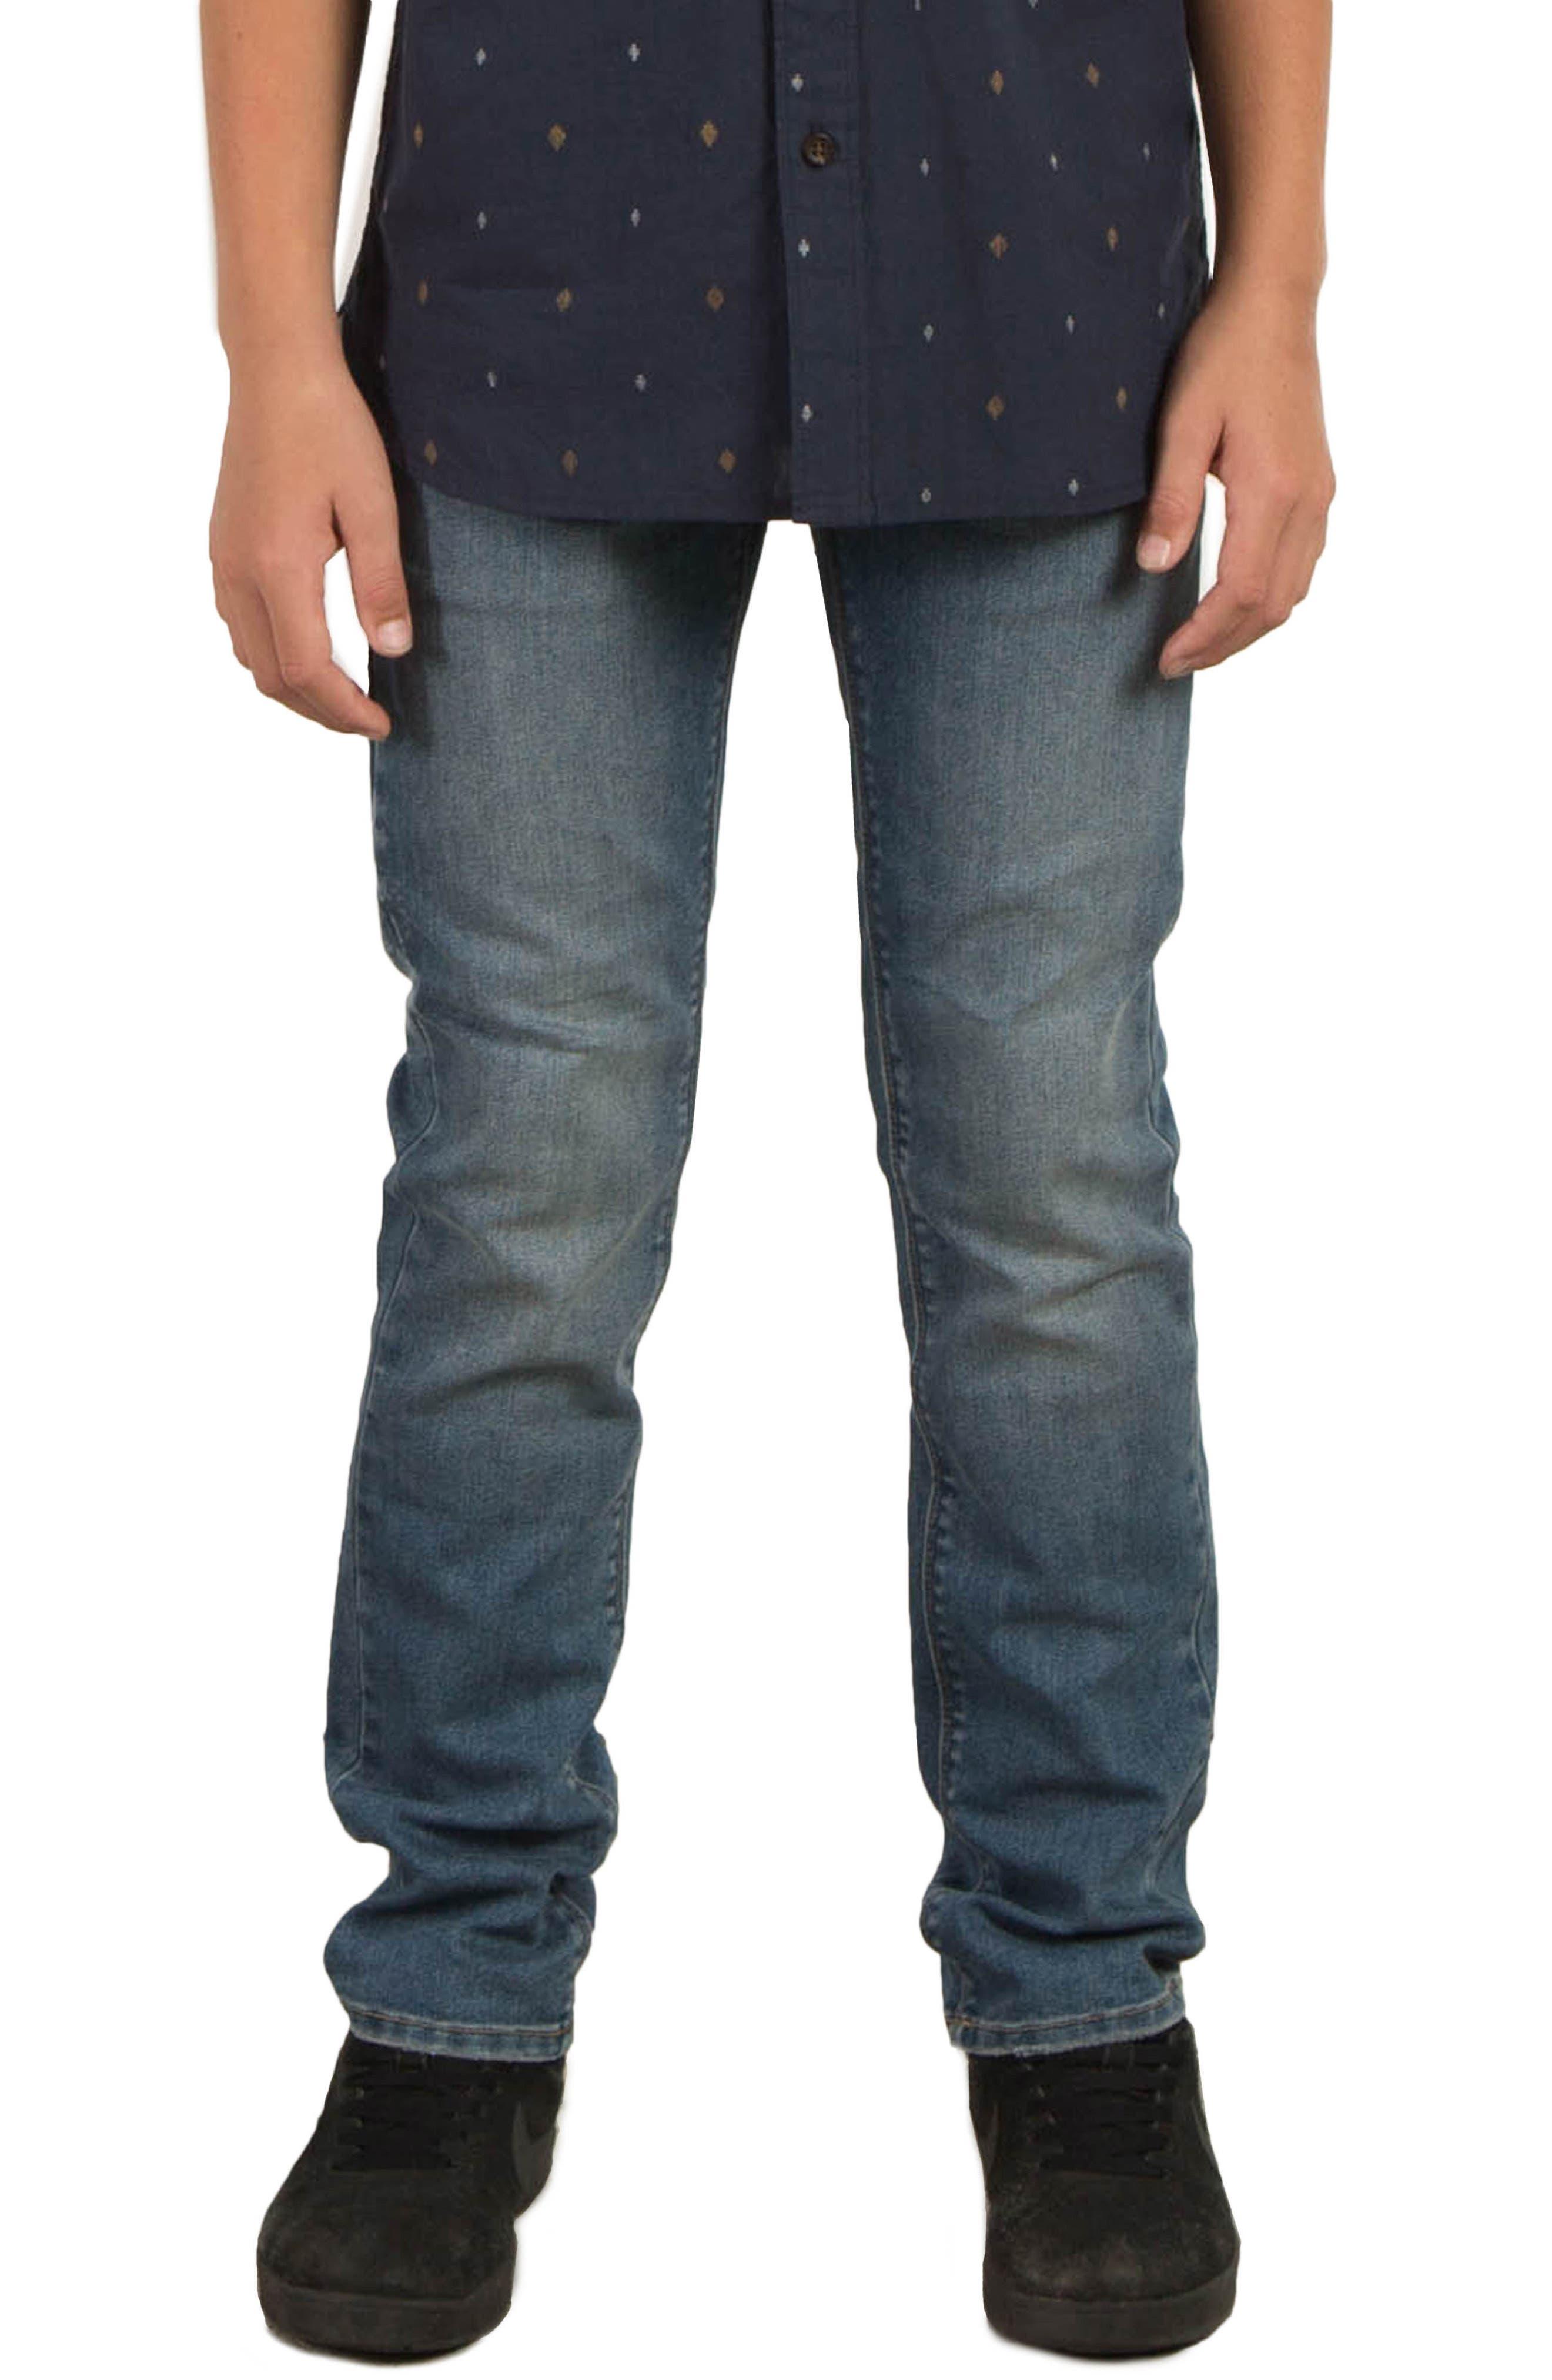 Vorta Slim Fit Jeans,                             Main thumbnail 1, color,                             Baja Indigo